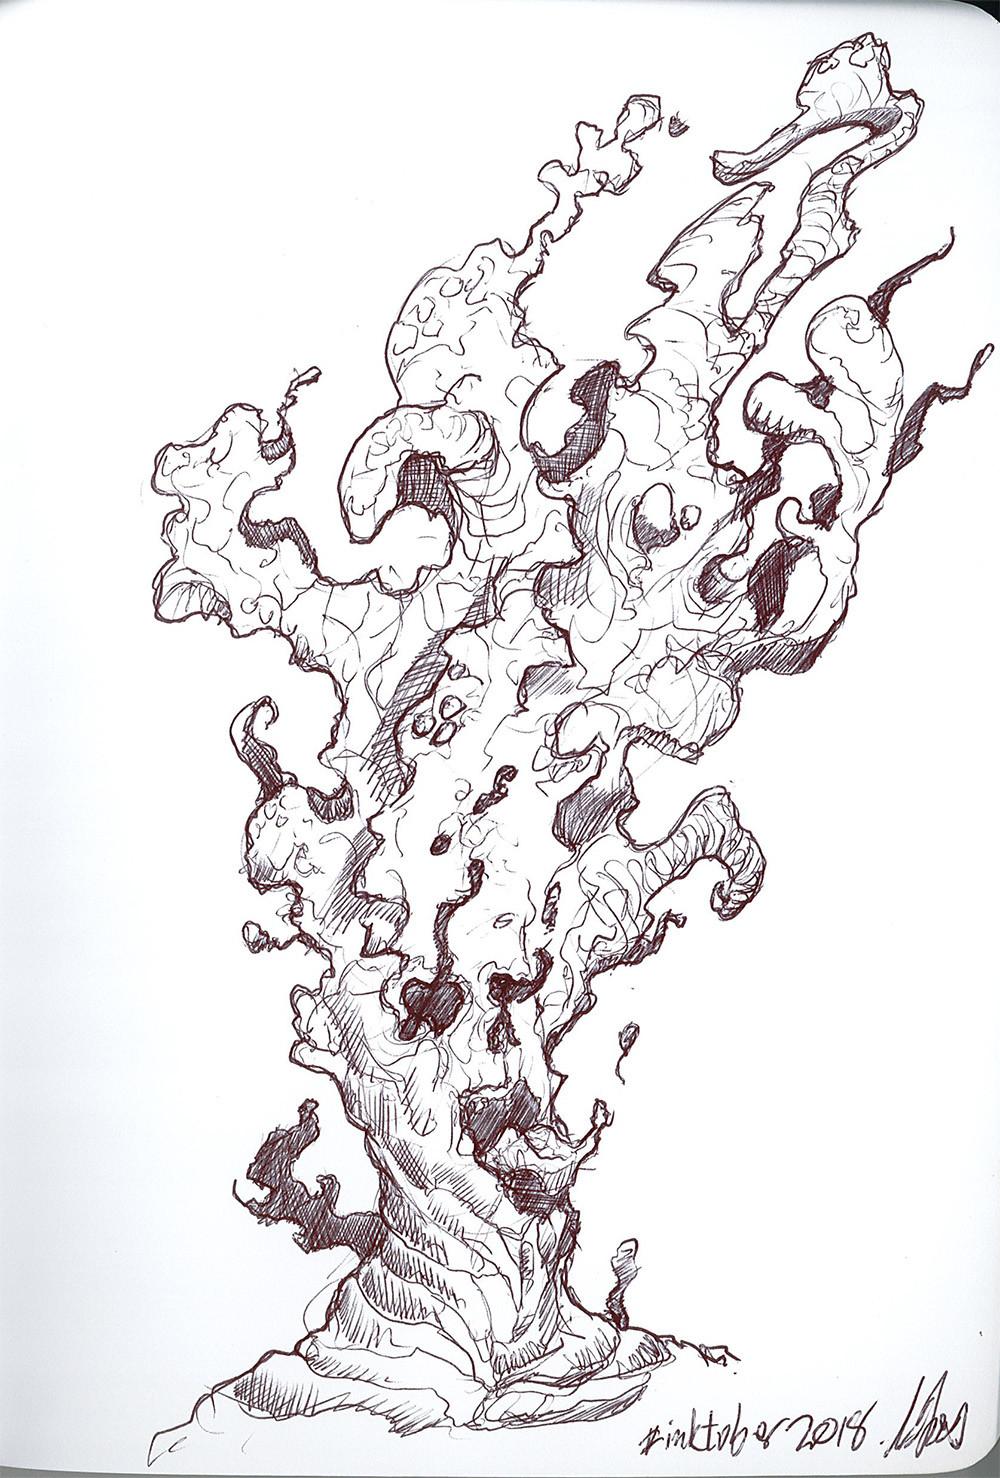 19 Breakdown dissolve